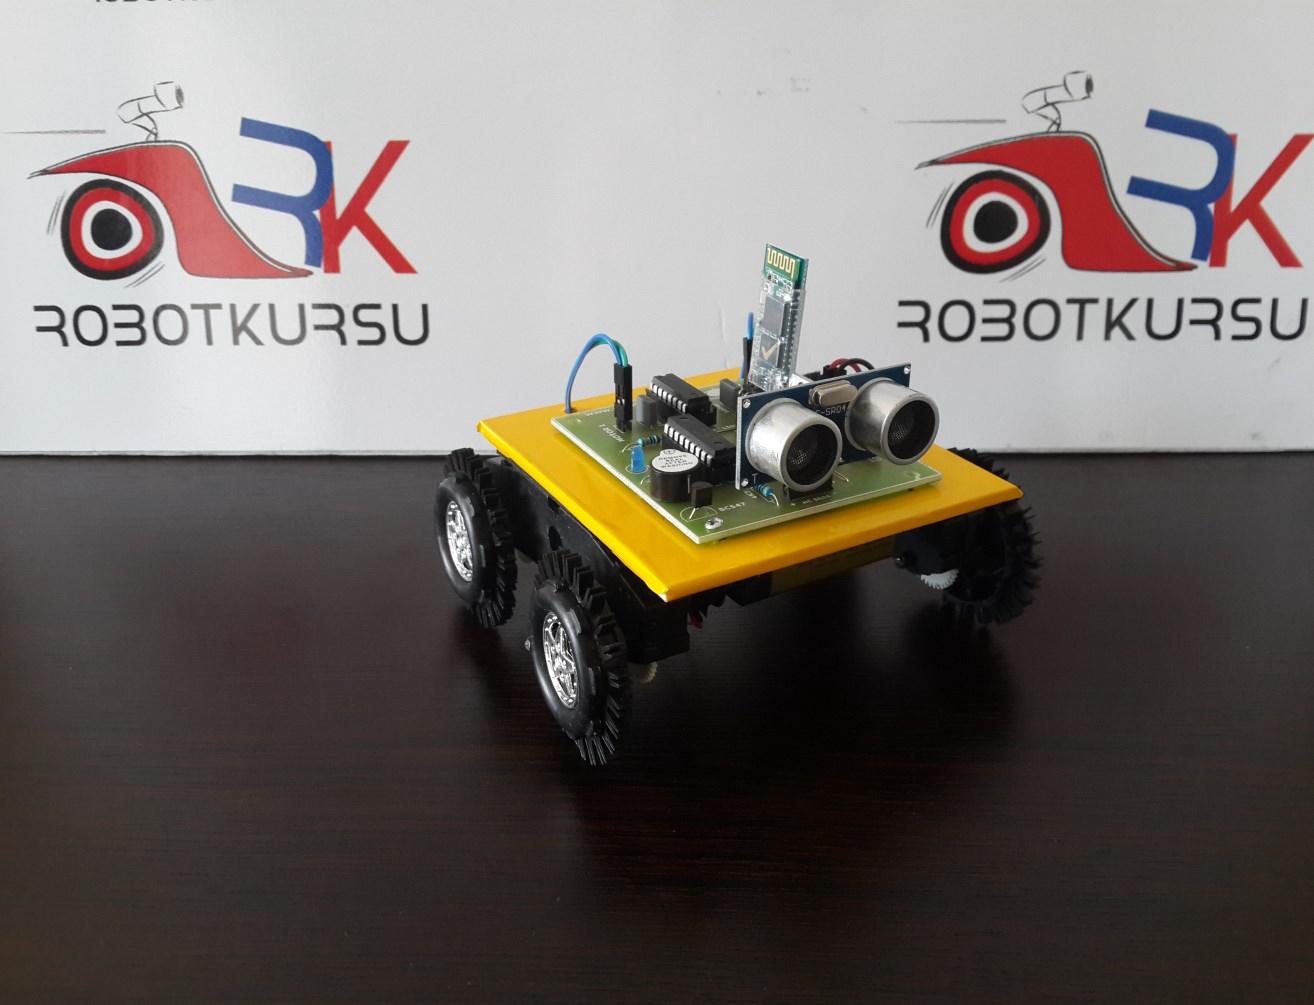 Bluetooth Kontrollü Robot